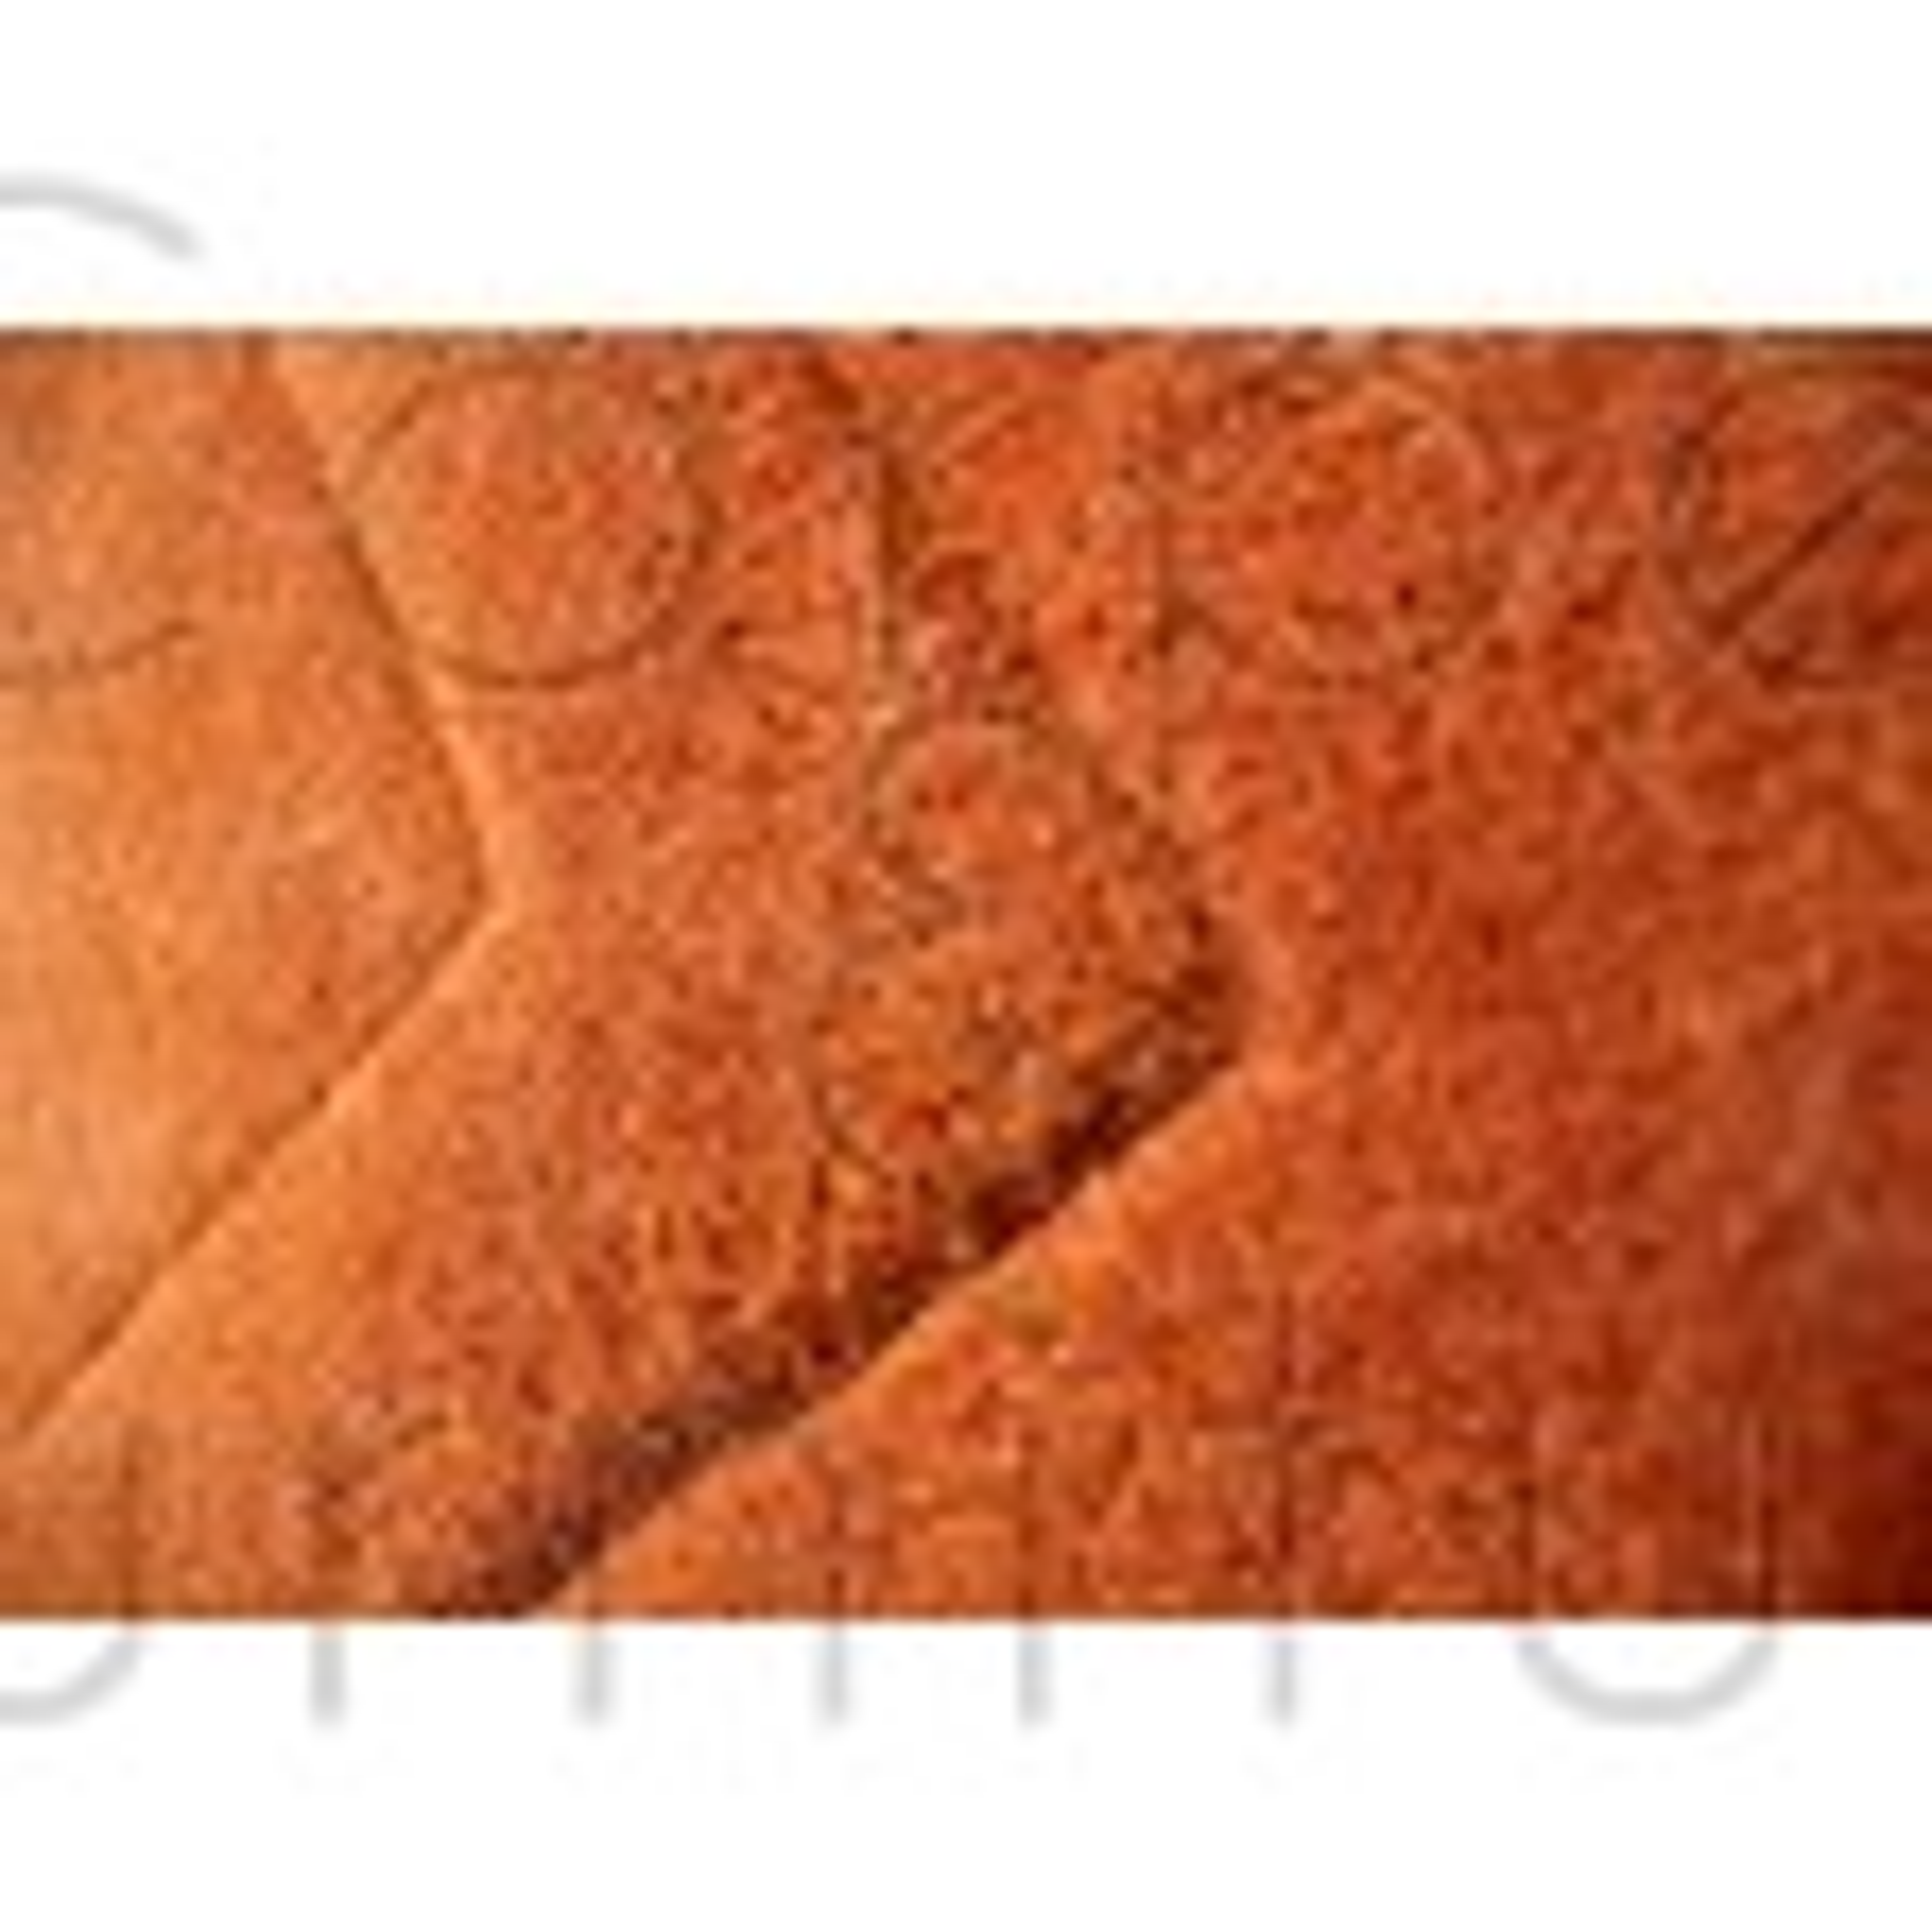 "Sierra Apollo Rug - Rust - Size 75 x 150 cm (2'6"" x 5')"